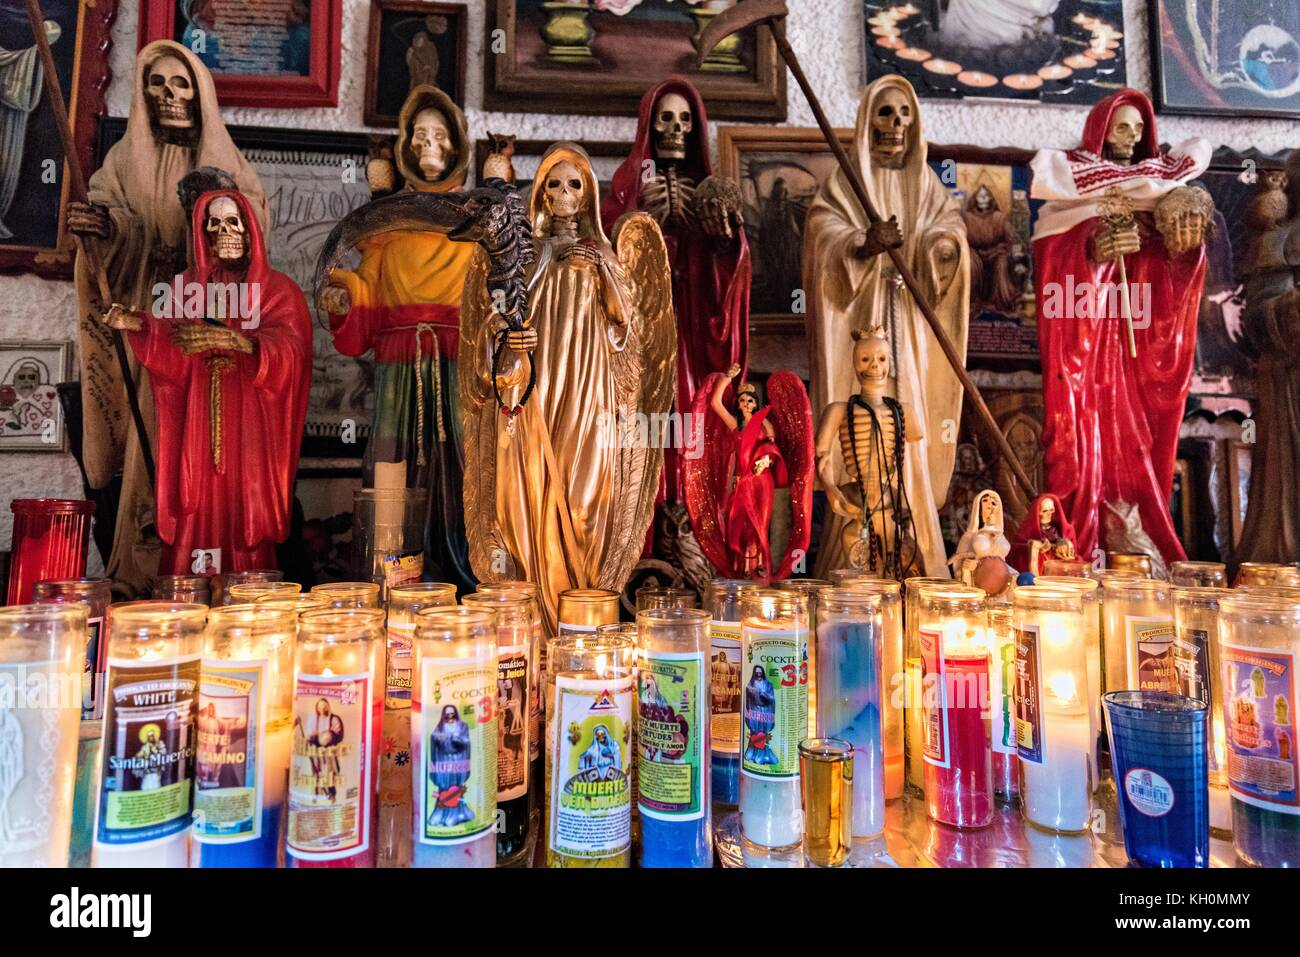 A shrine and offerings inside the La Casa De La Santa Muerte or